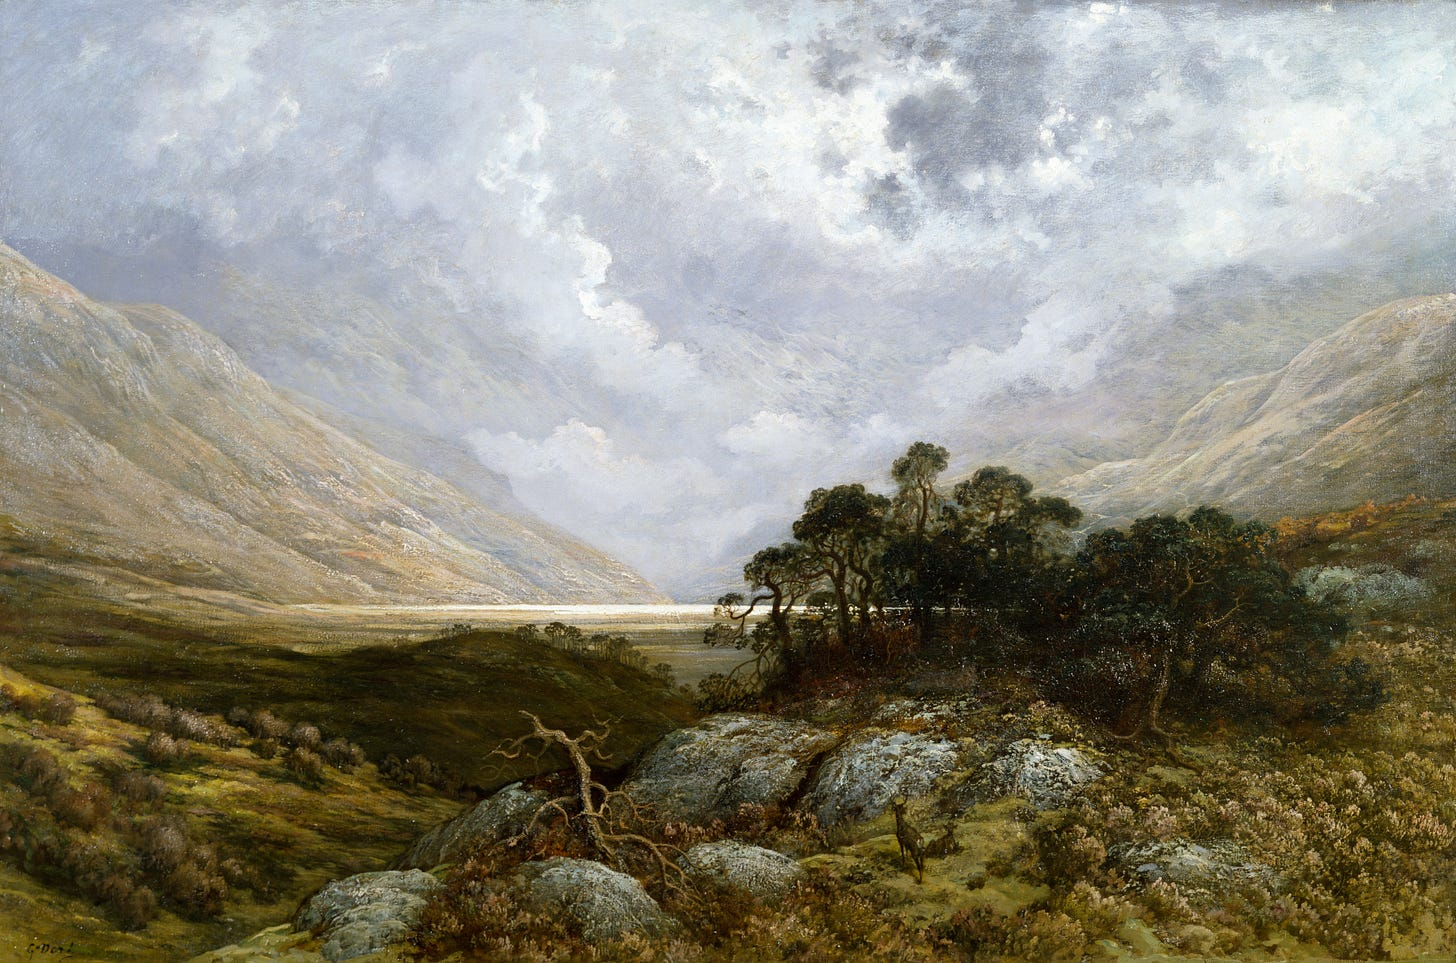 Gustave Doré - Landscape in Scotland - Walters 372625.jpg